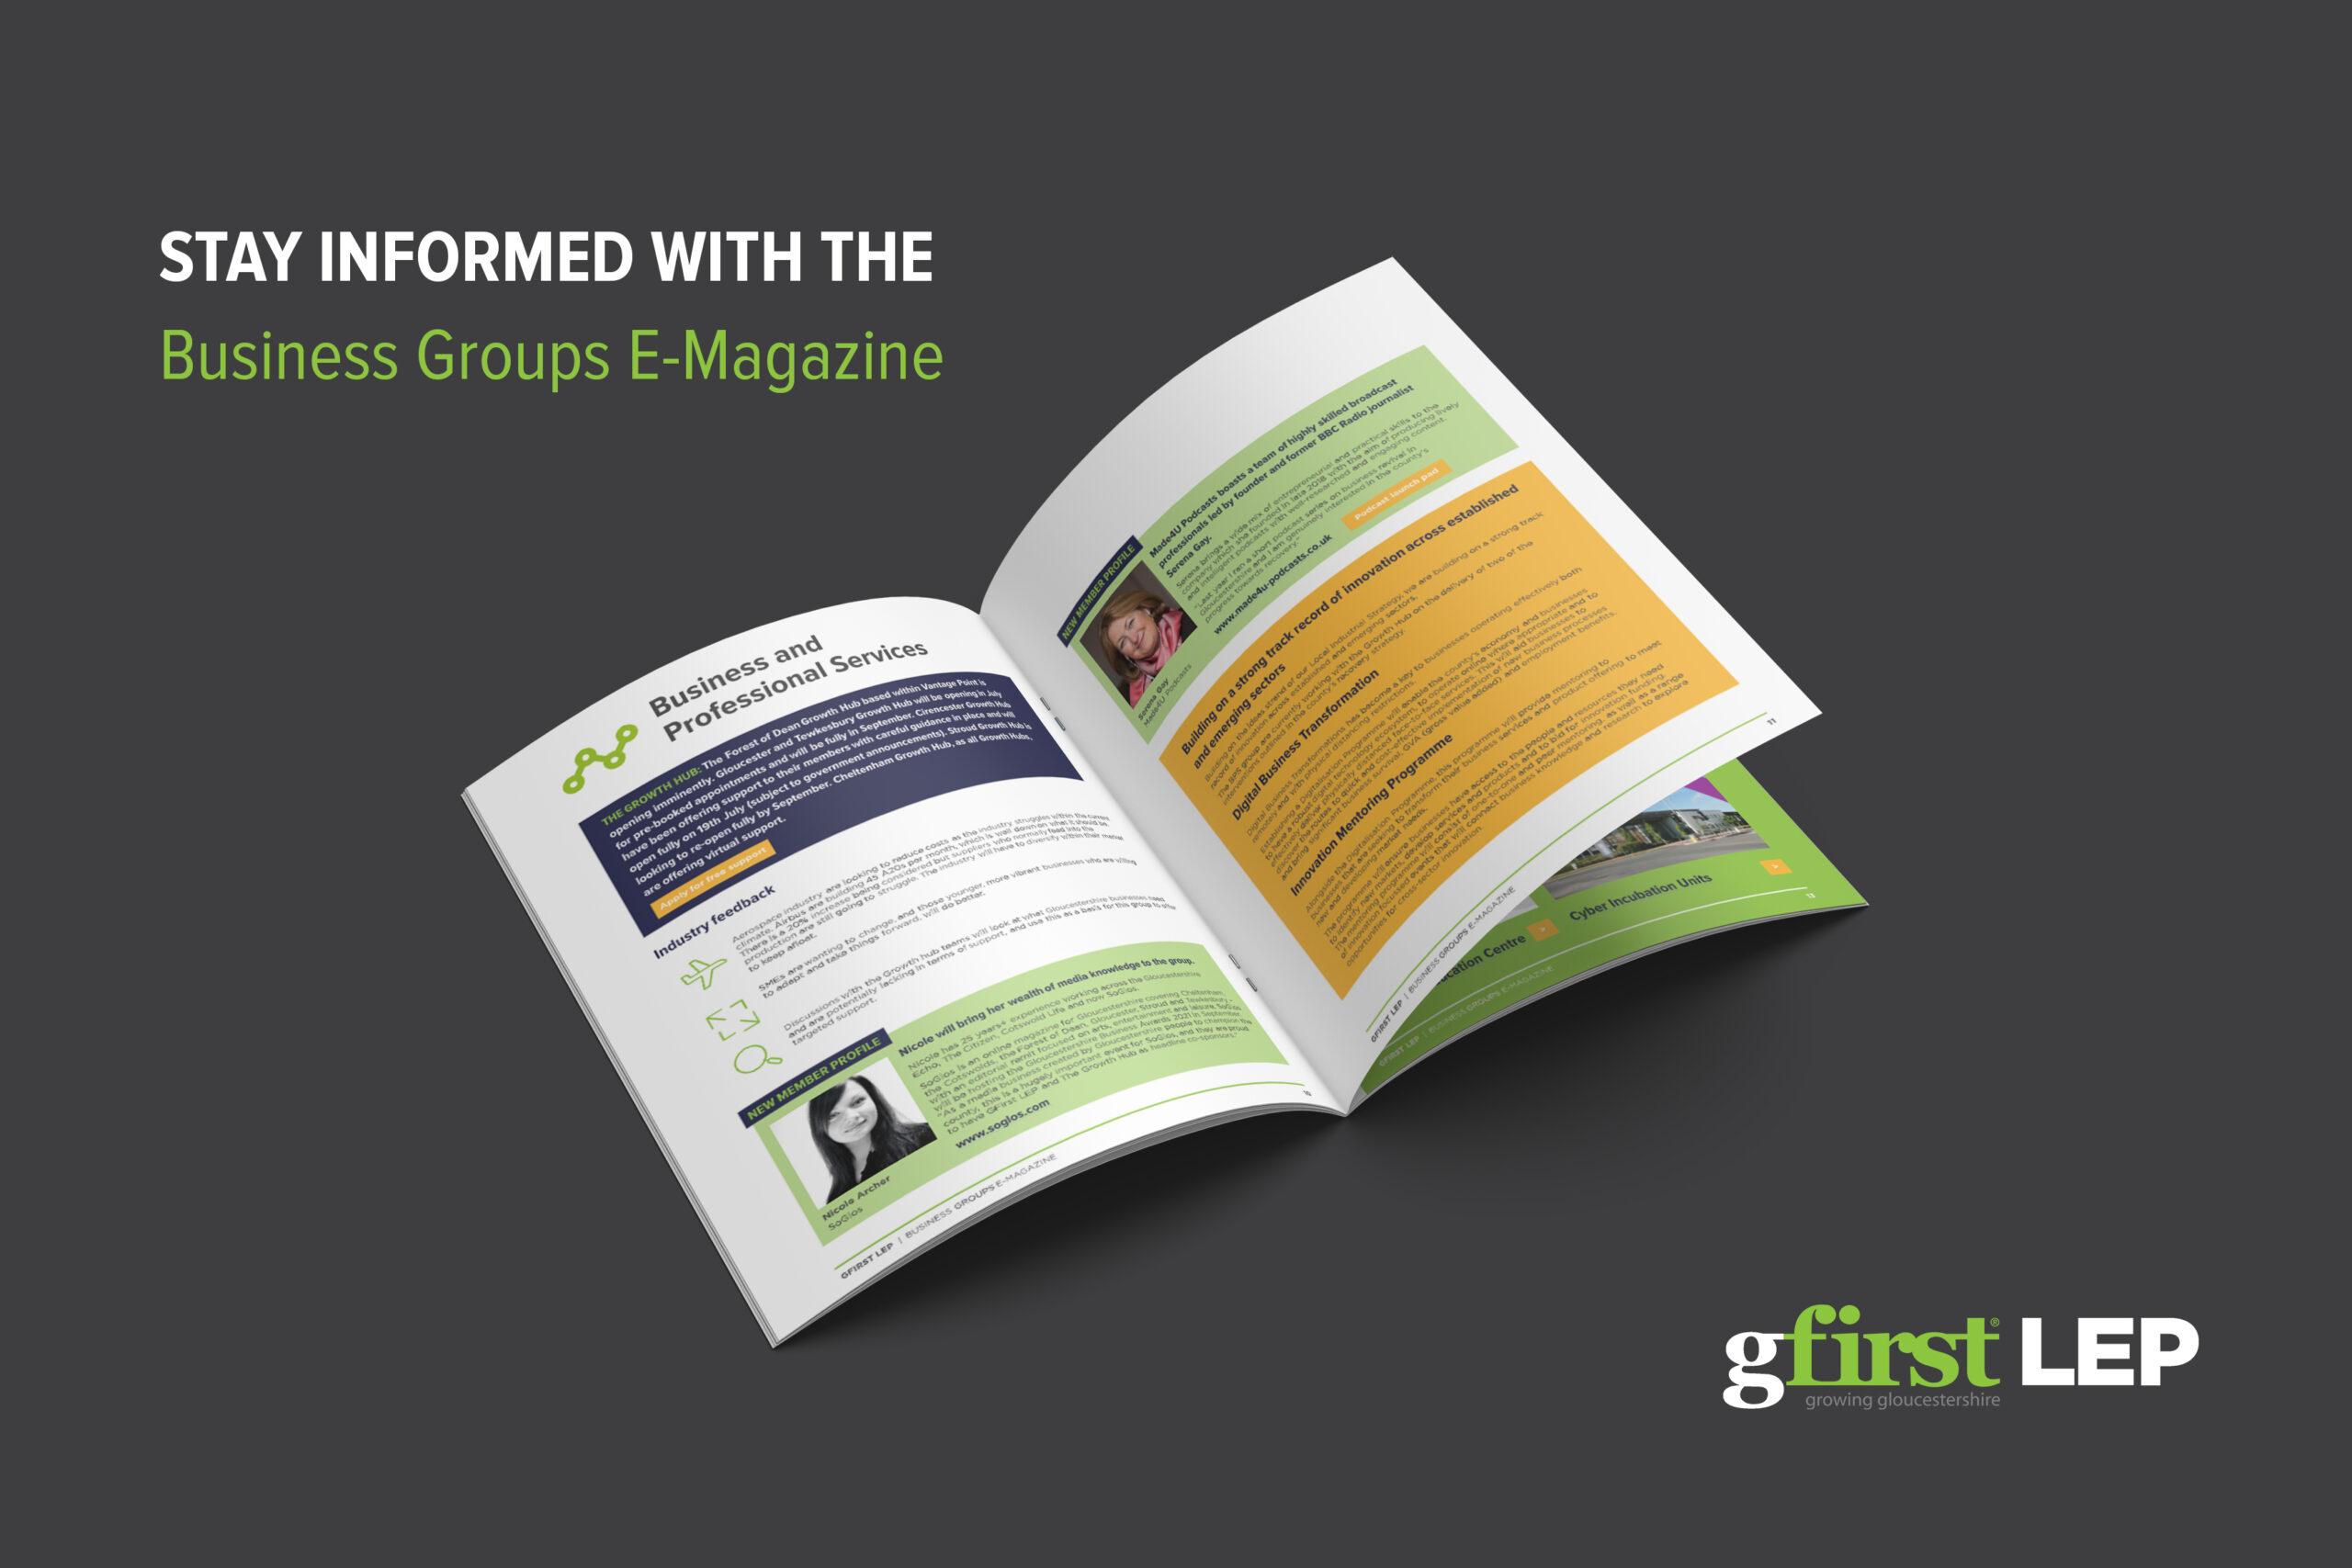 GFirst LEP-Business Groups E-Magazine